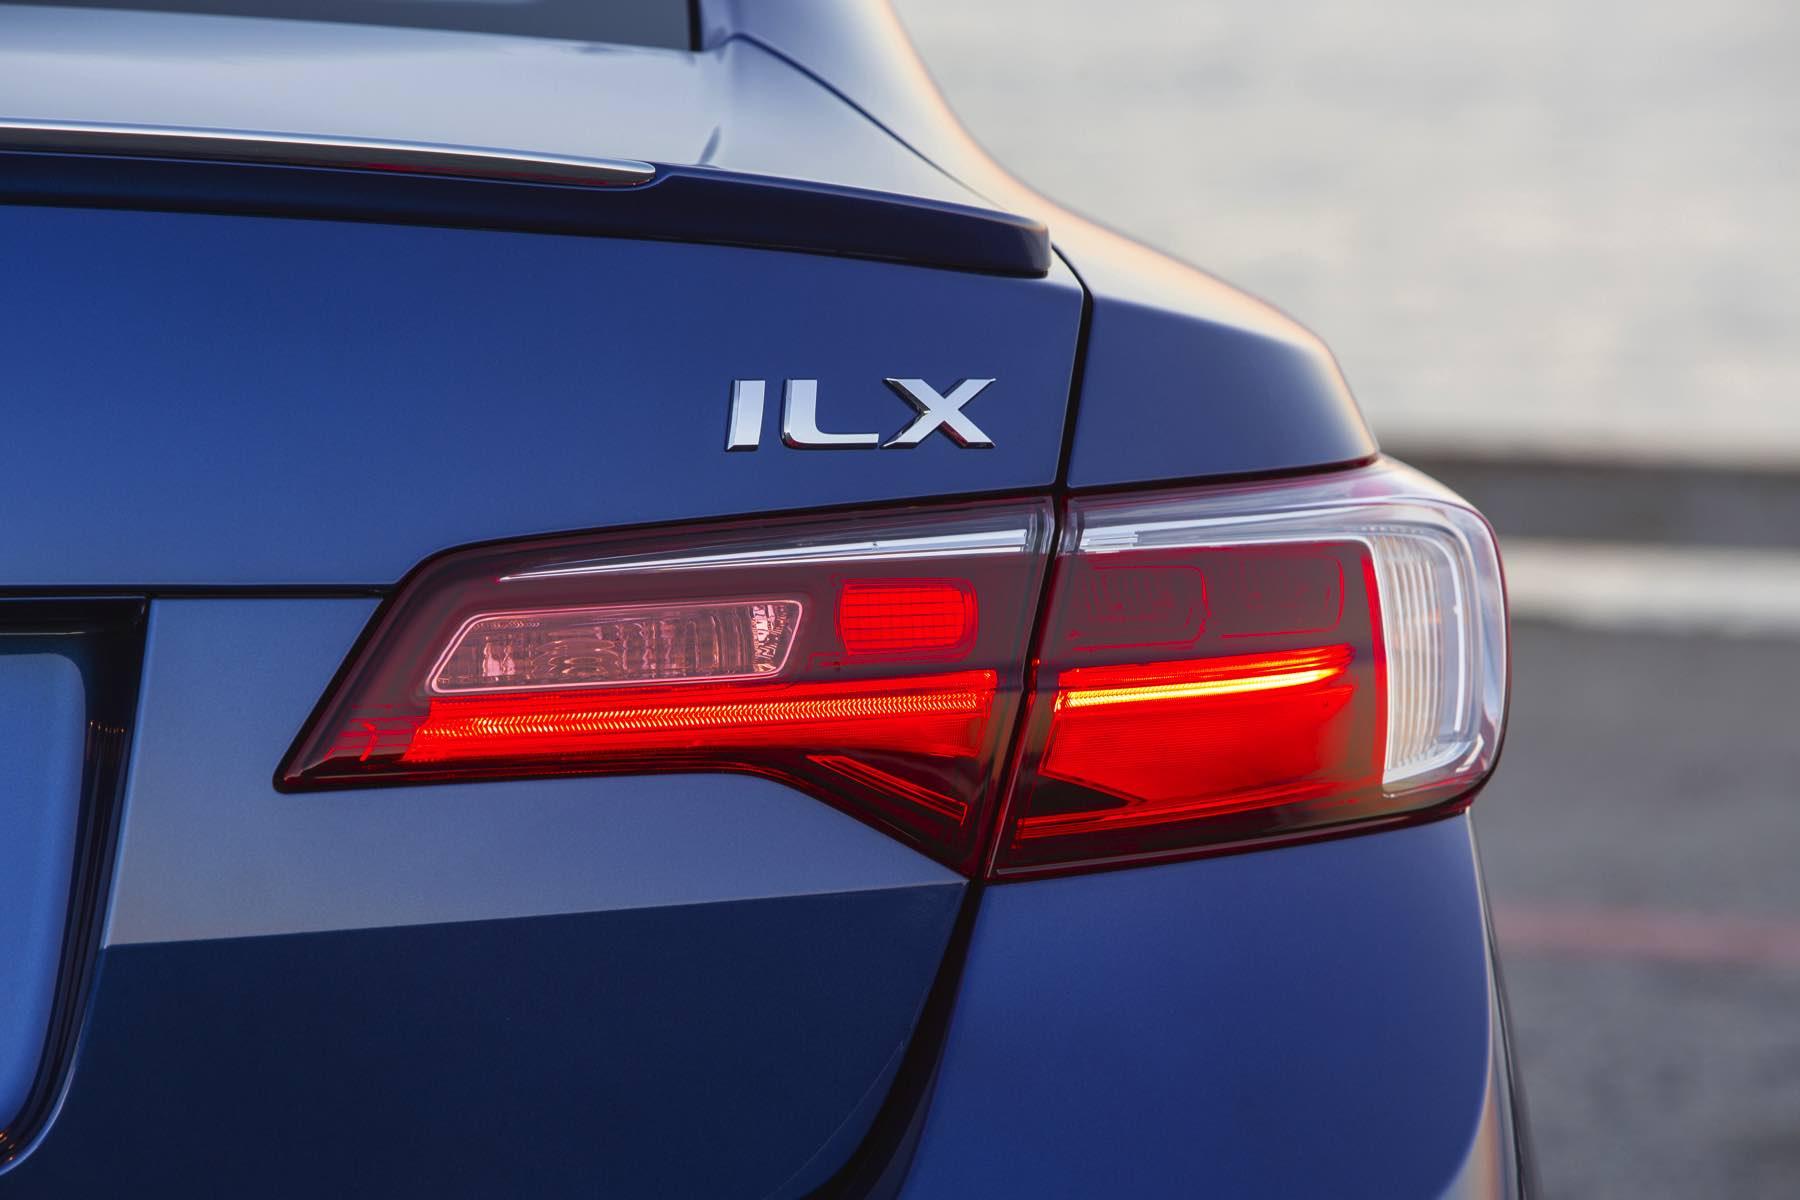 Acura-ILX-016